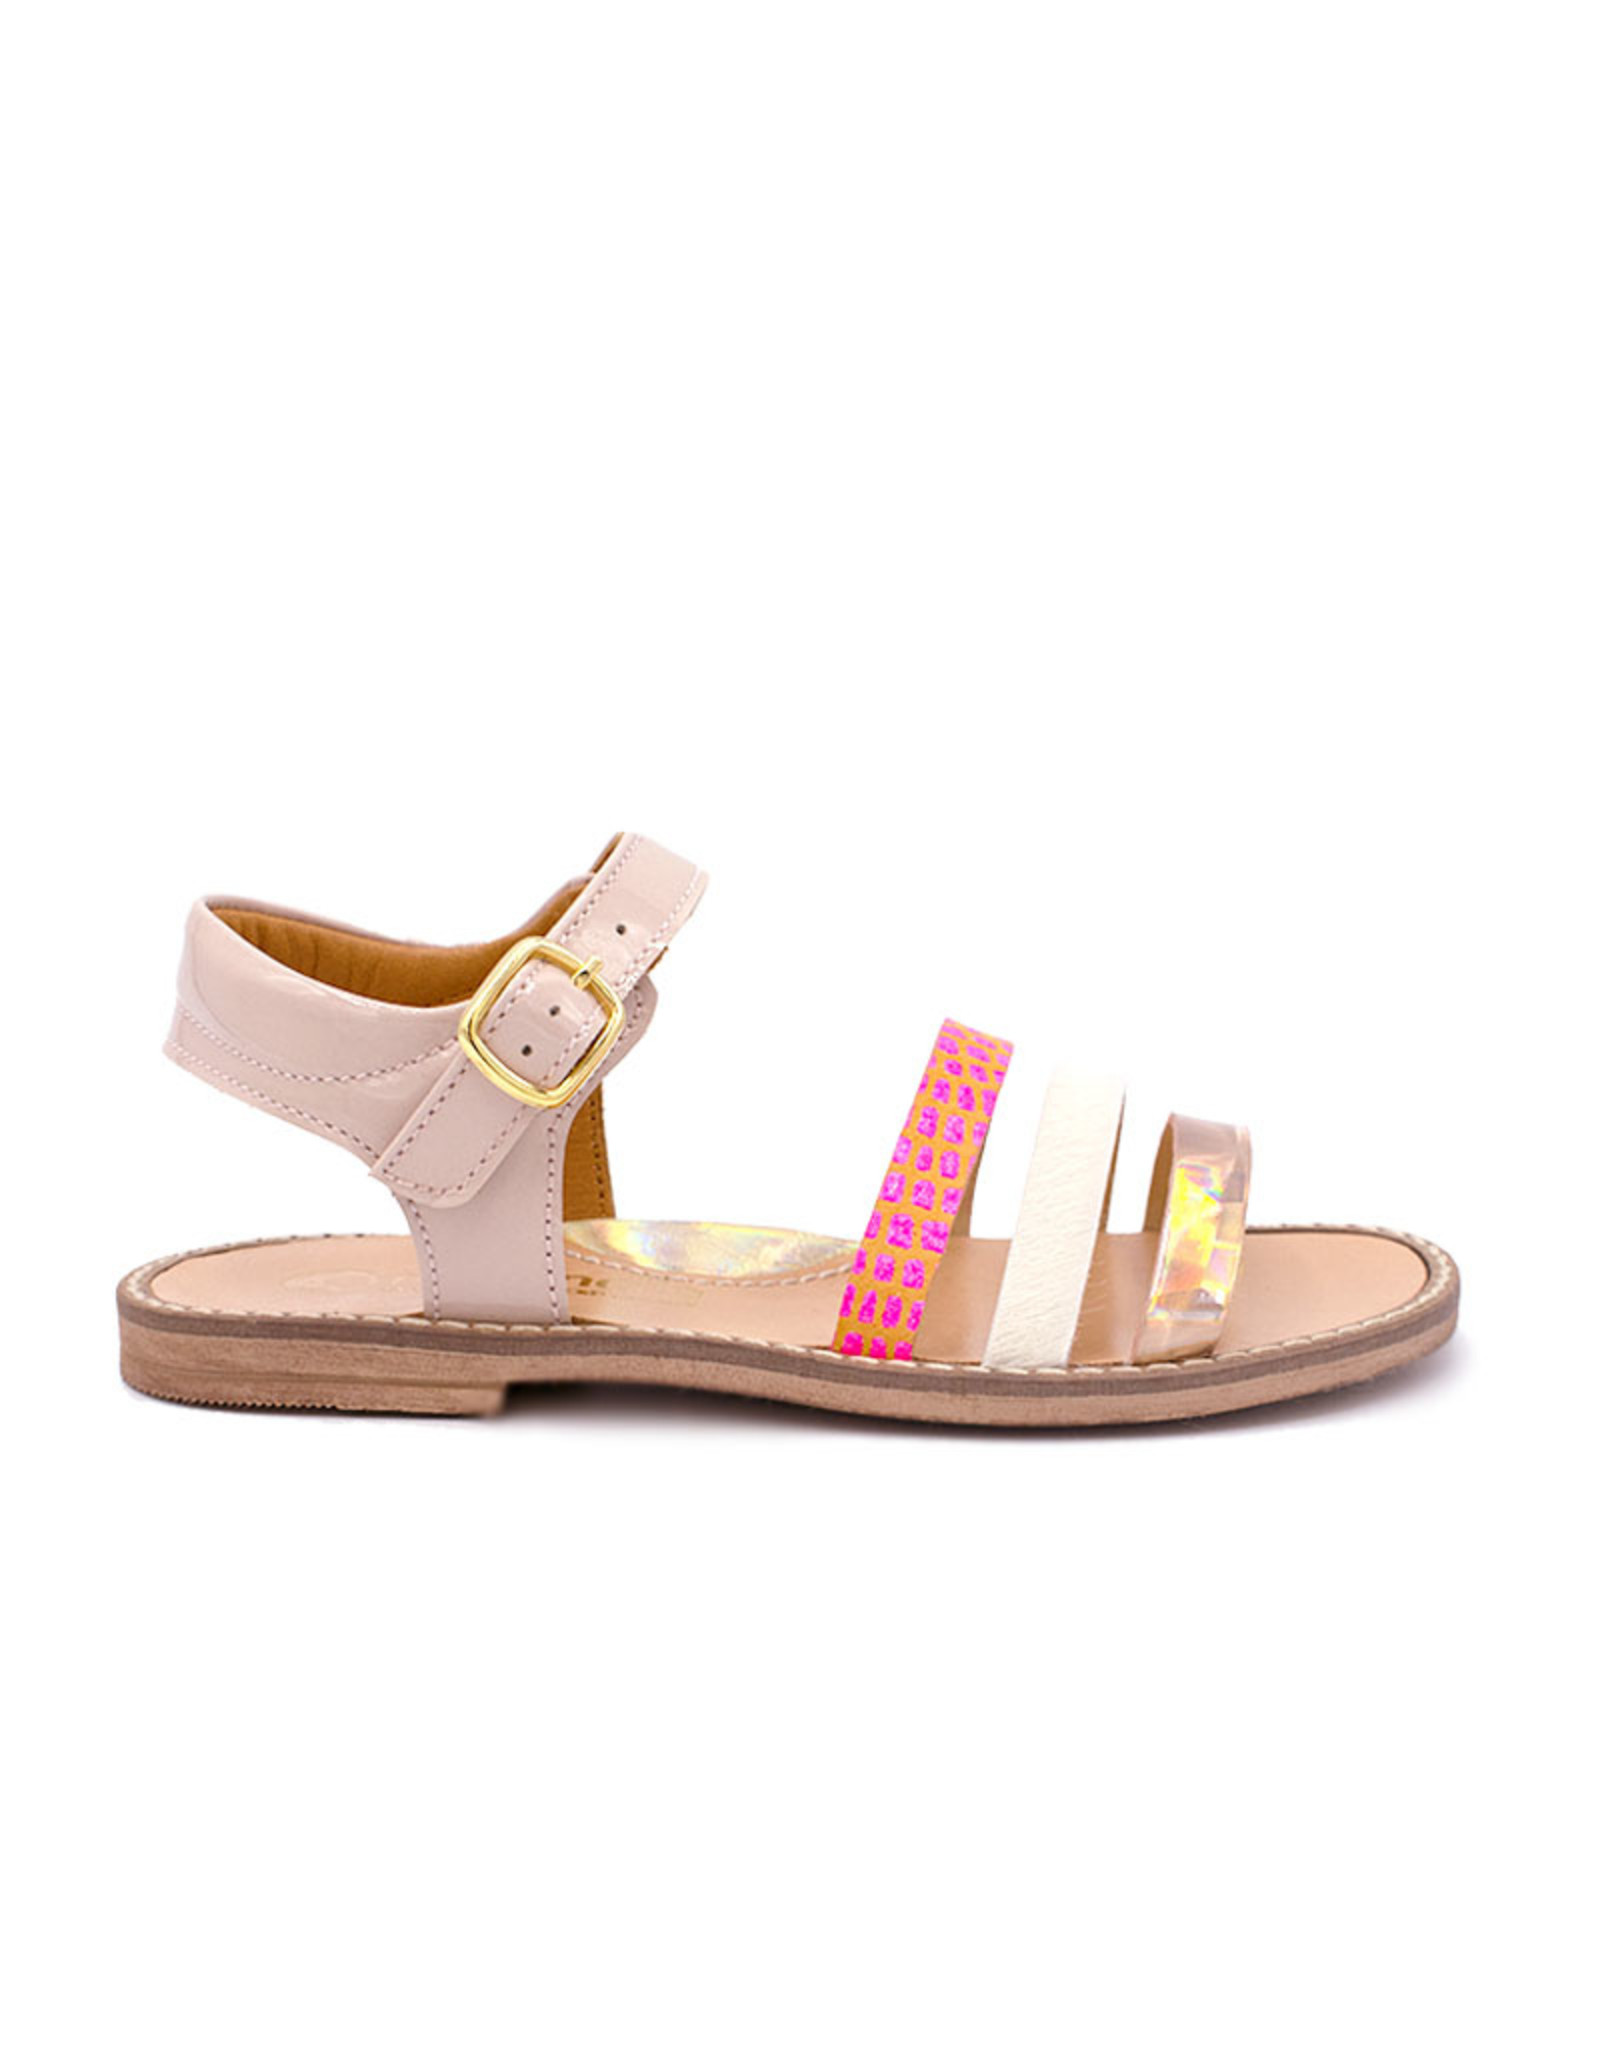 RONDINELLA RONDINELLA sandaal kleur bandjes